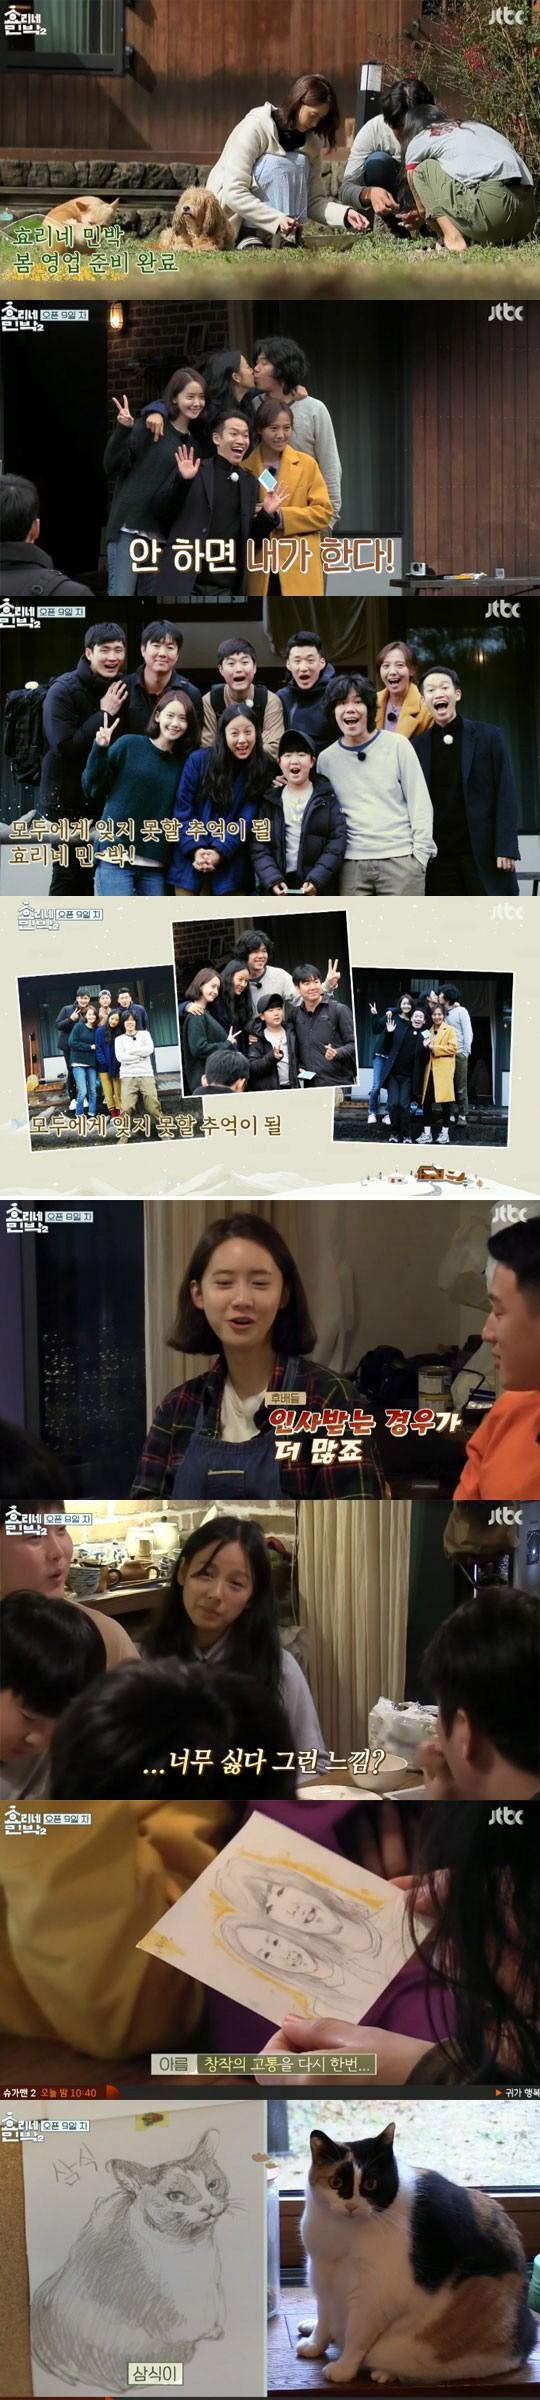 1n2d season 2 joo won dating 3